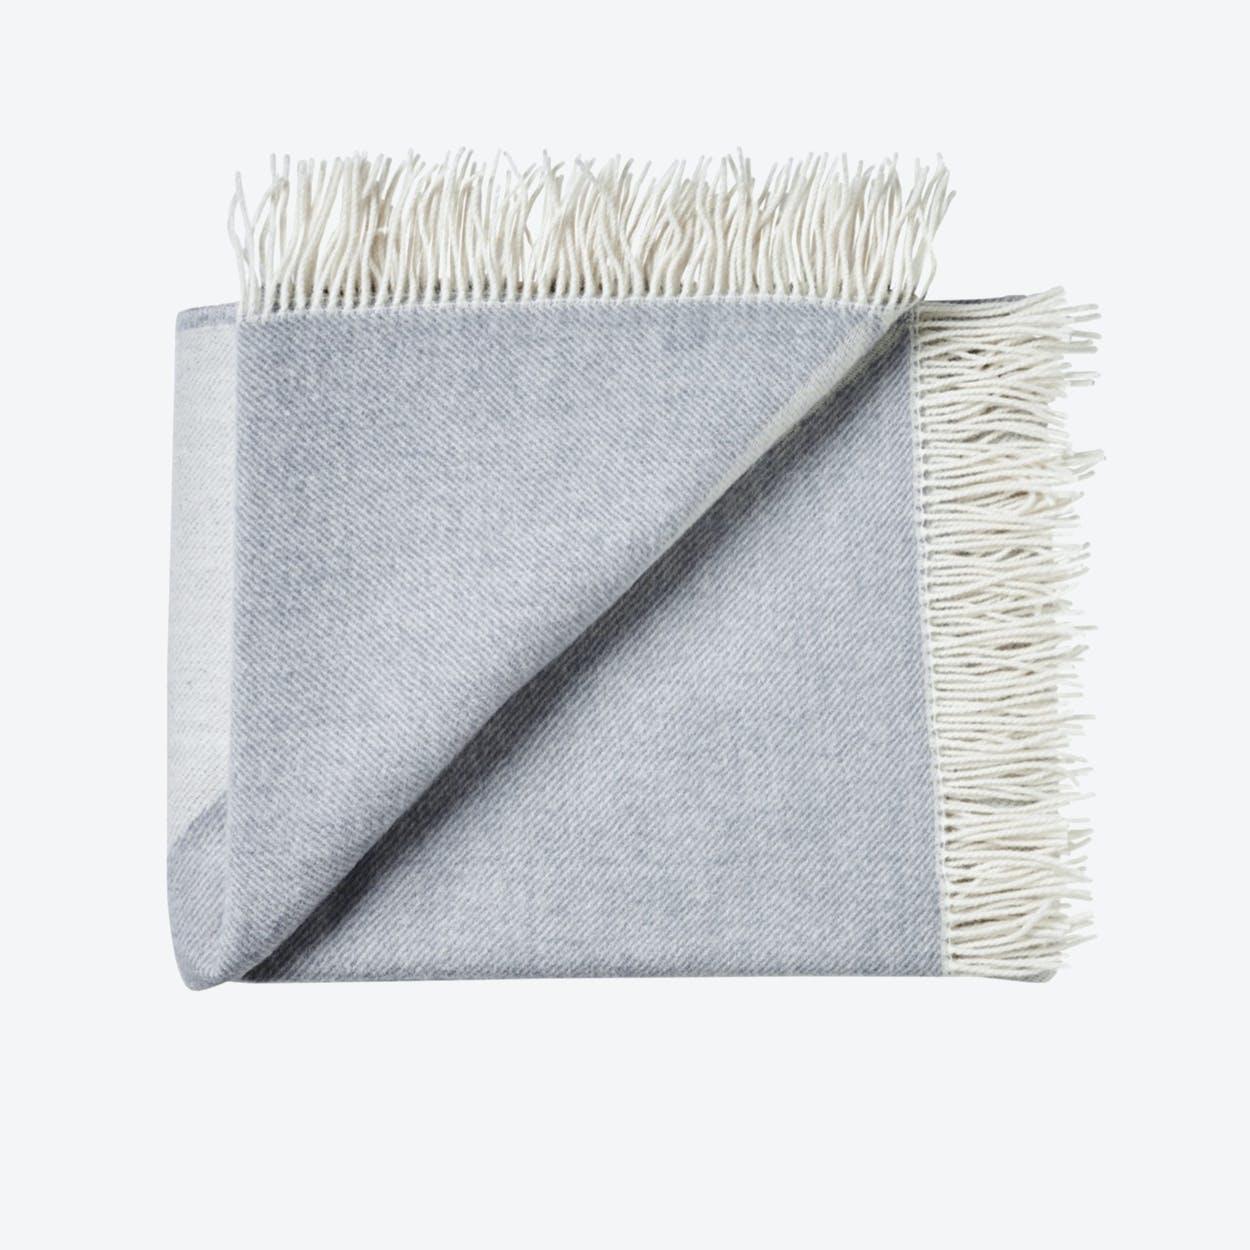 Focus on Twill Wool Throw in Light-Grey